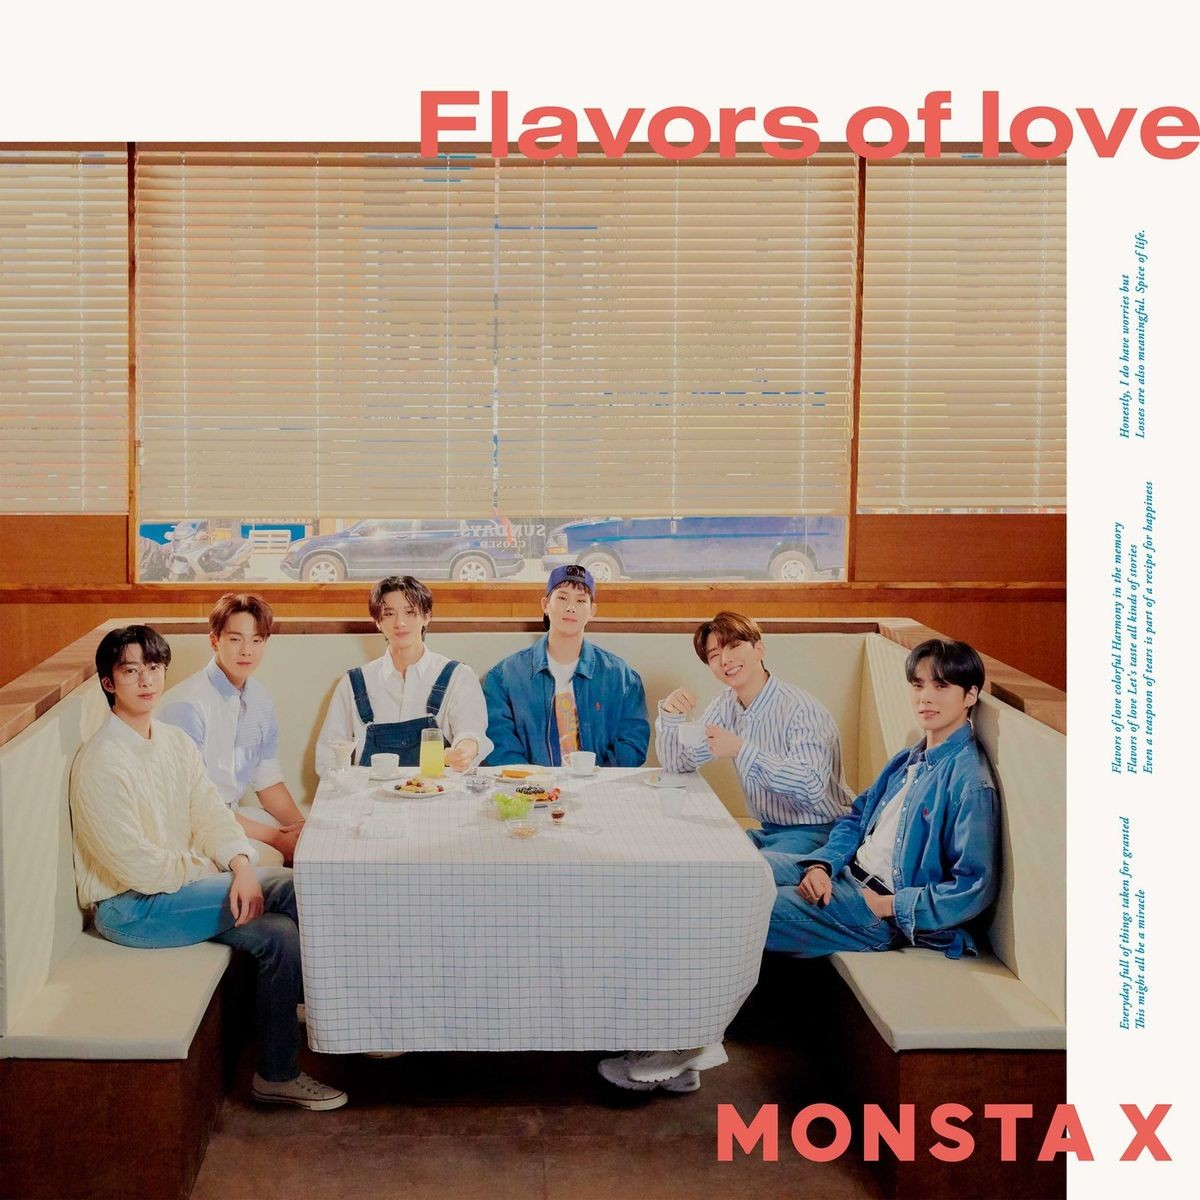 MONSTA X – Flavors Of Love [FLAC + AAC 256 / WEB] [2021.05.05]